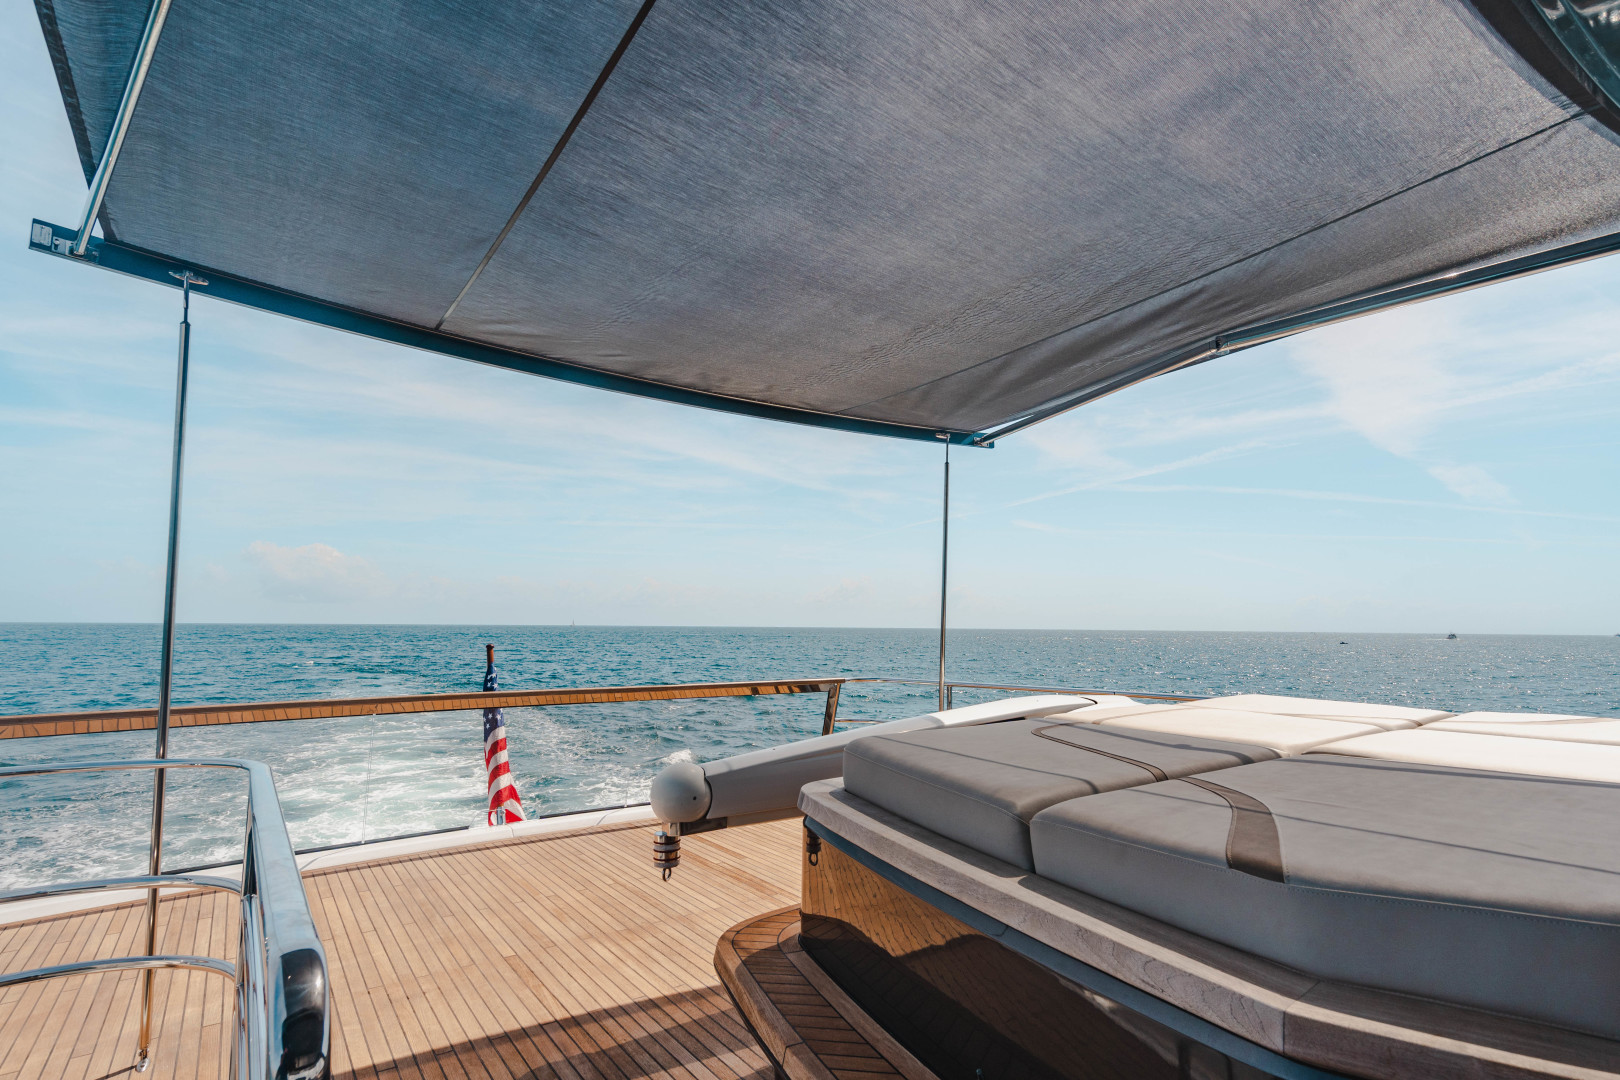 Princess-Y85  2019-Splash Delray Beach-Florida-United States-1631663 | Thumbnail